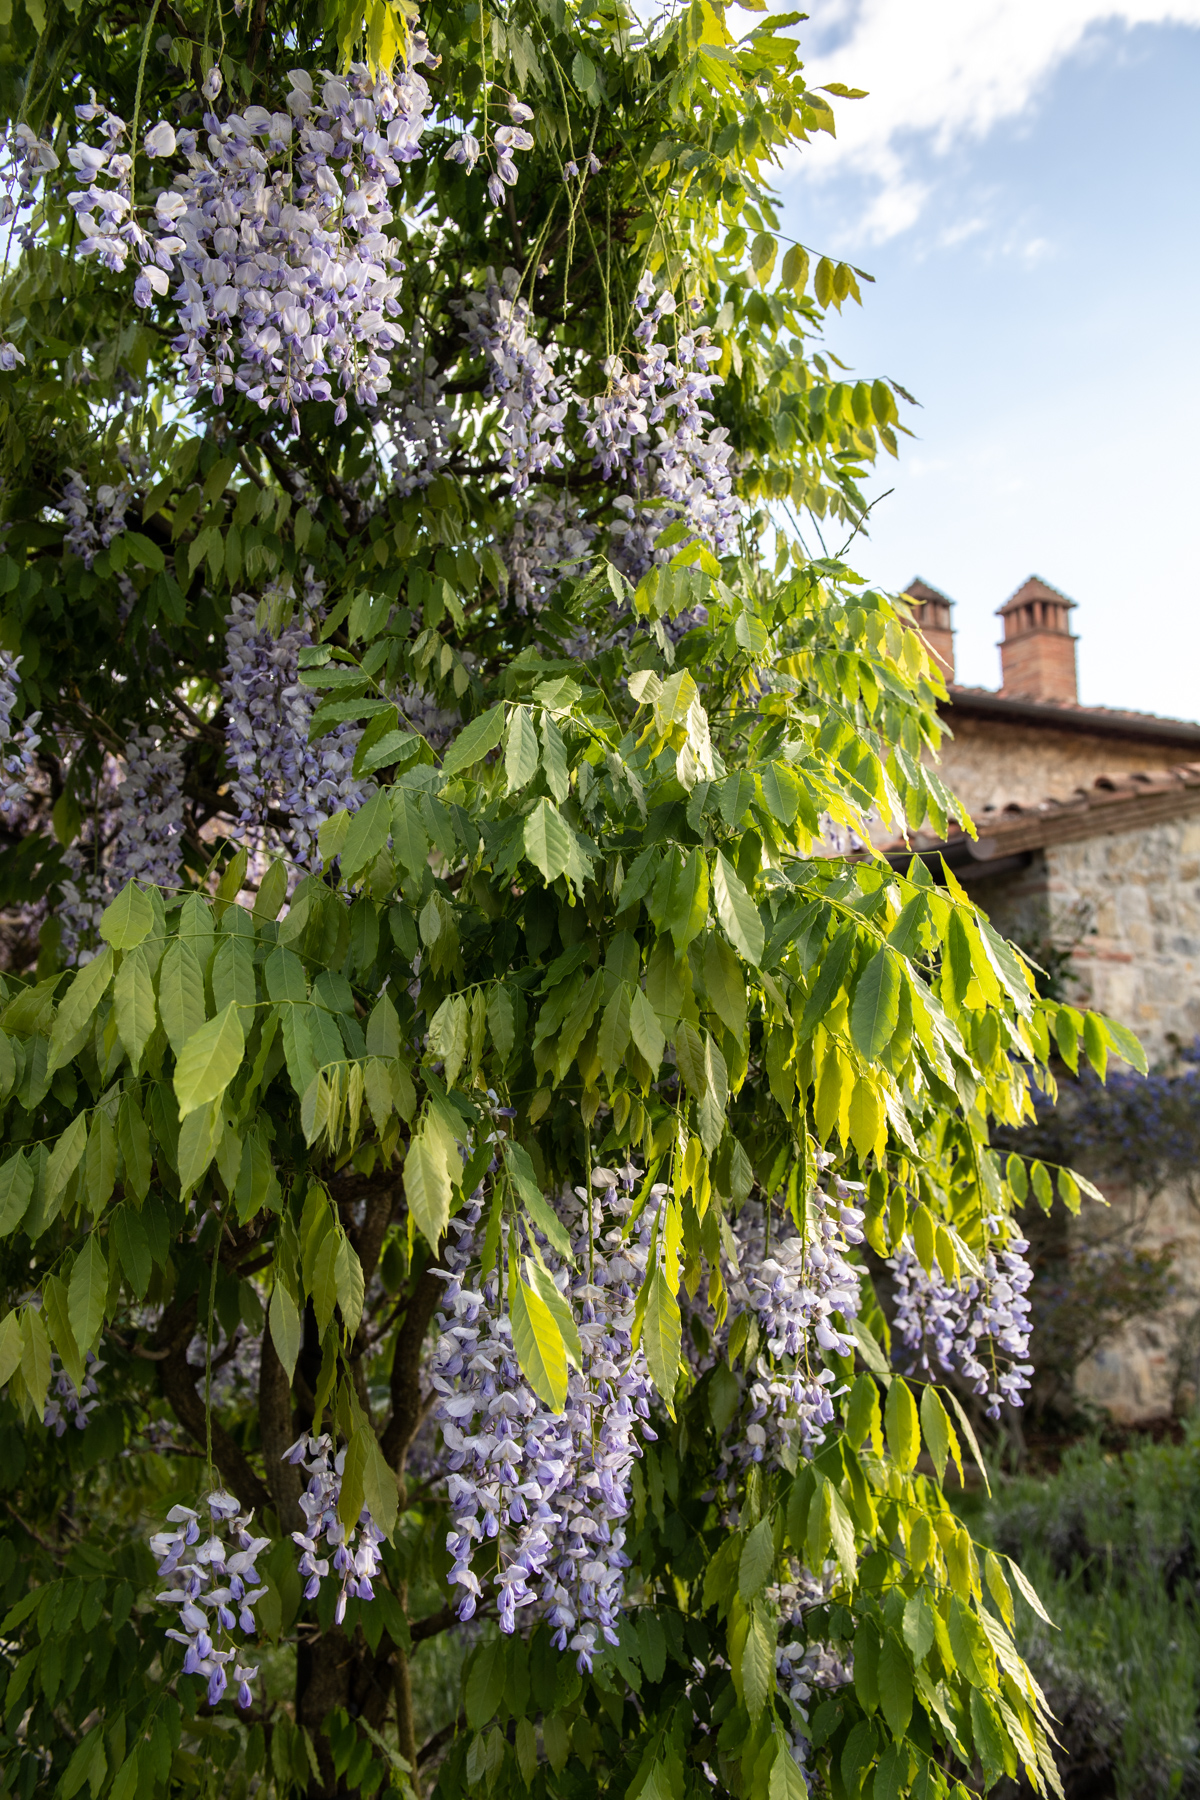 Stacie Flinner x Cuvee Tuscan Farmhouse Tuscany Italy Guide-17.jpg